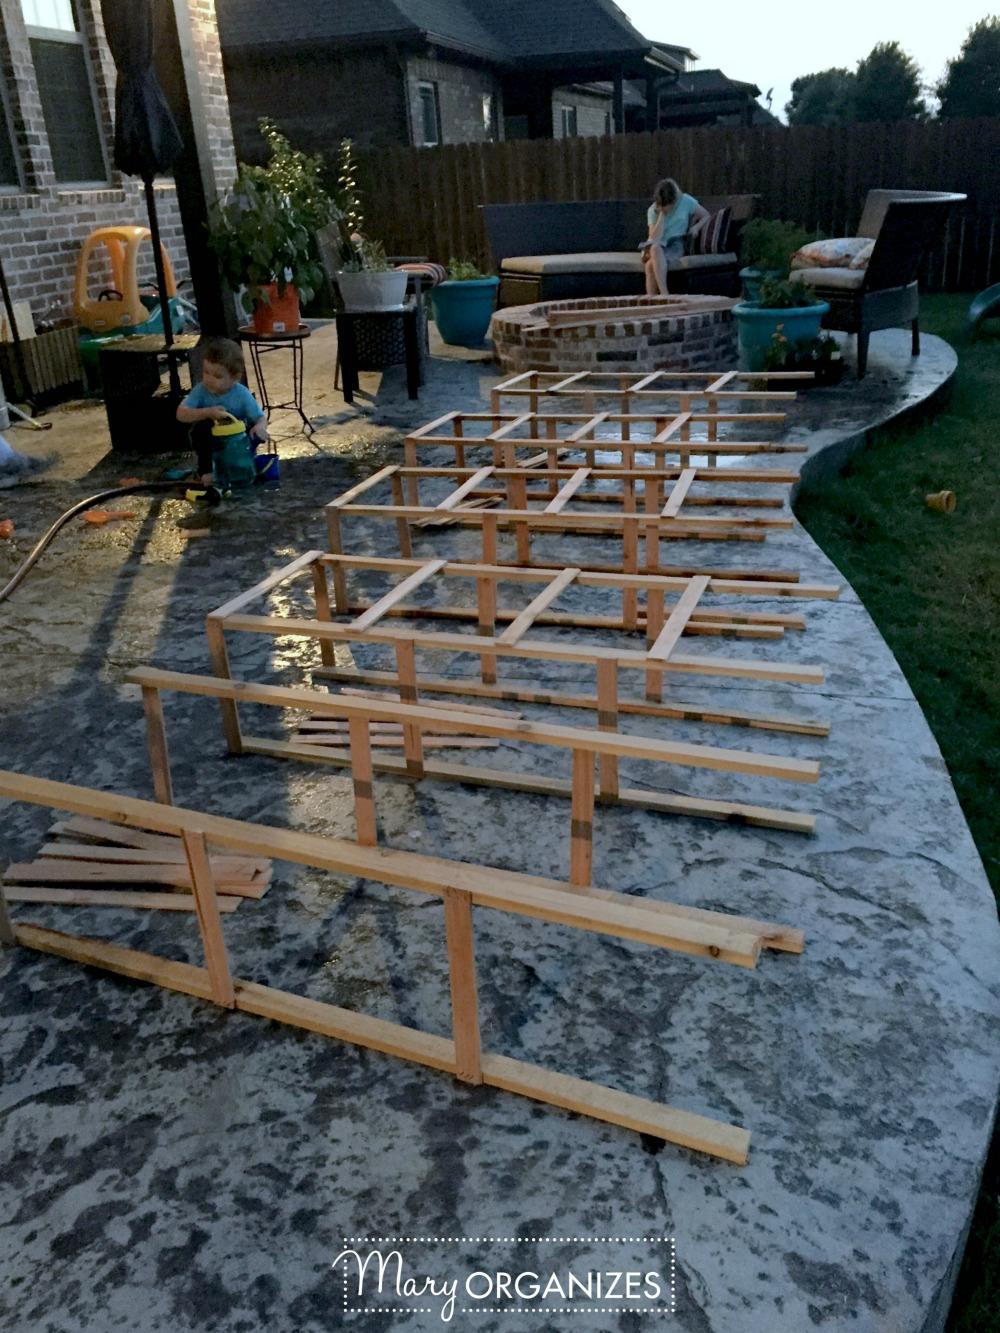 DIY Tomato Cage Tutorial for the Organic Garden 3